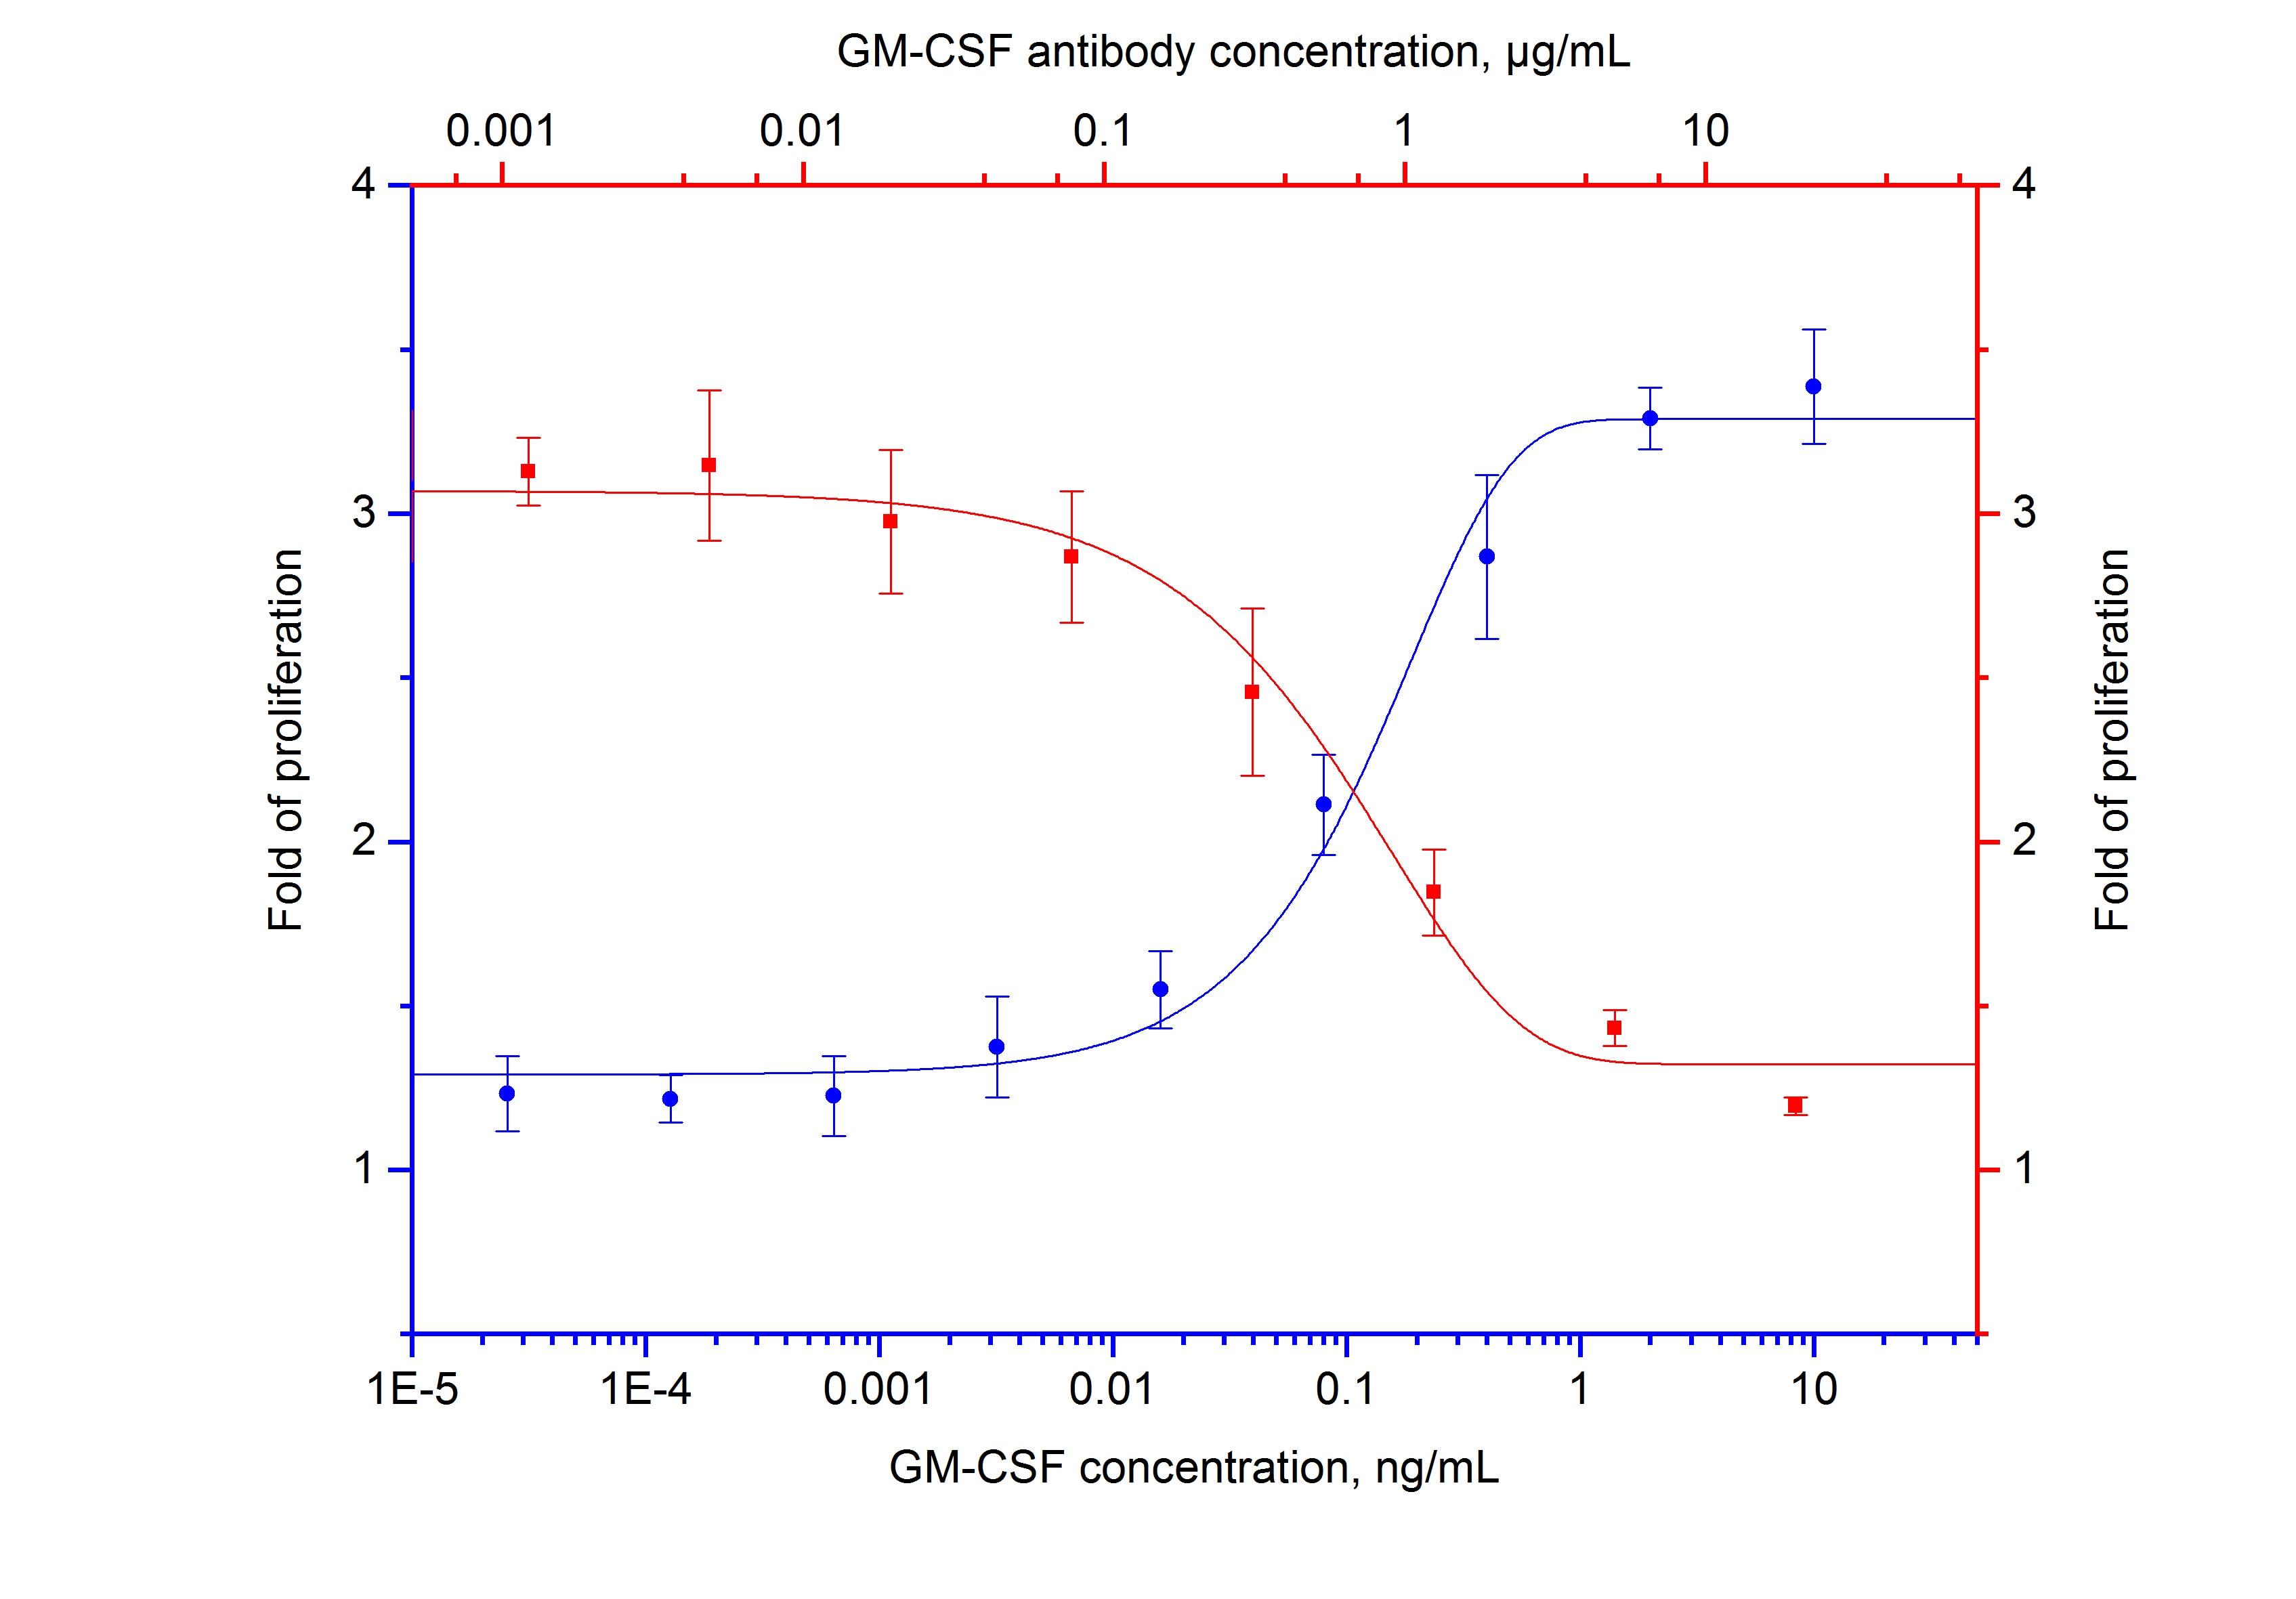 Neutralization experiment of NeutraKine® GM-CSF using 69003-1-Ig